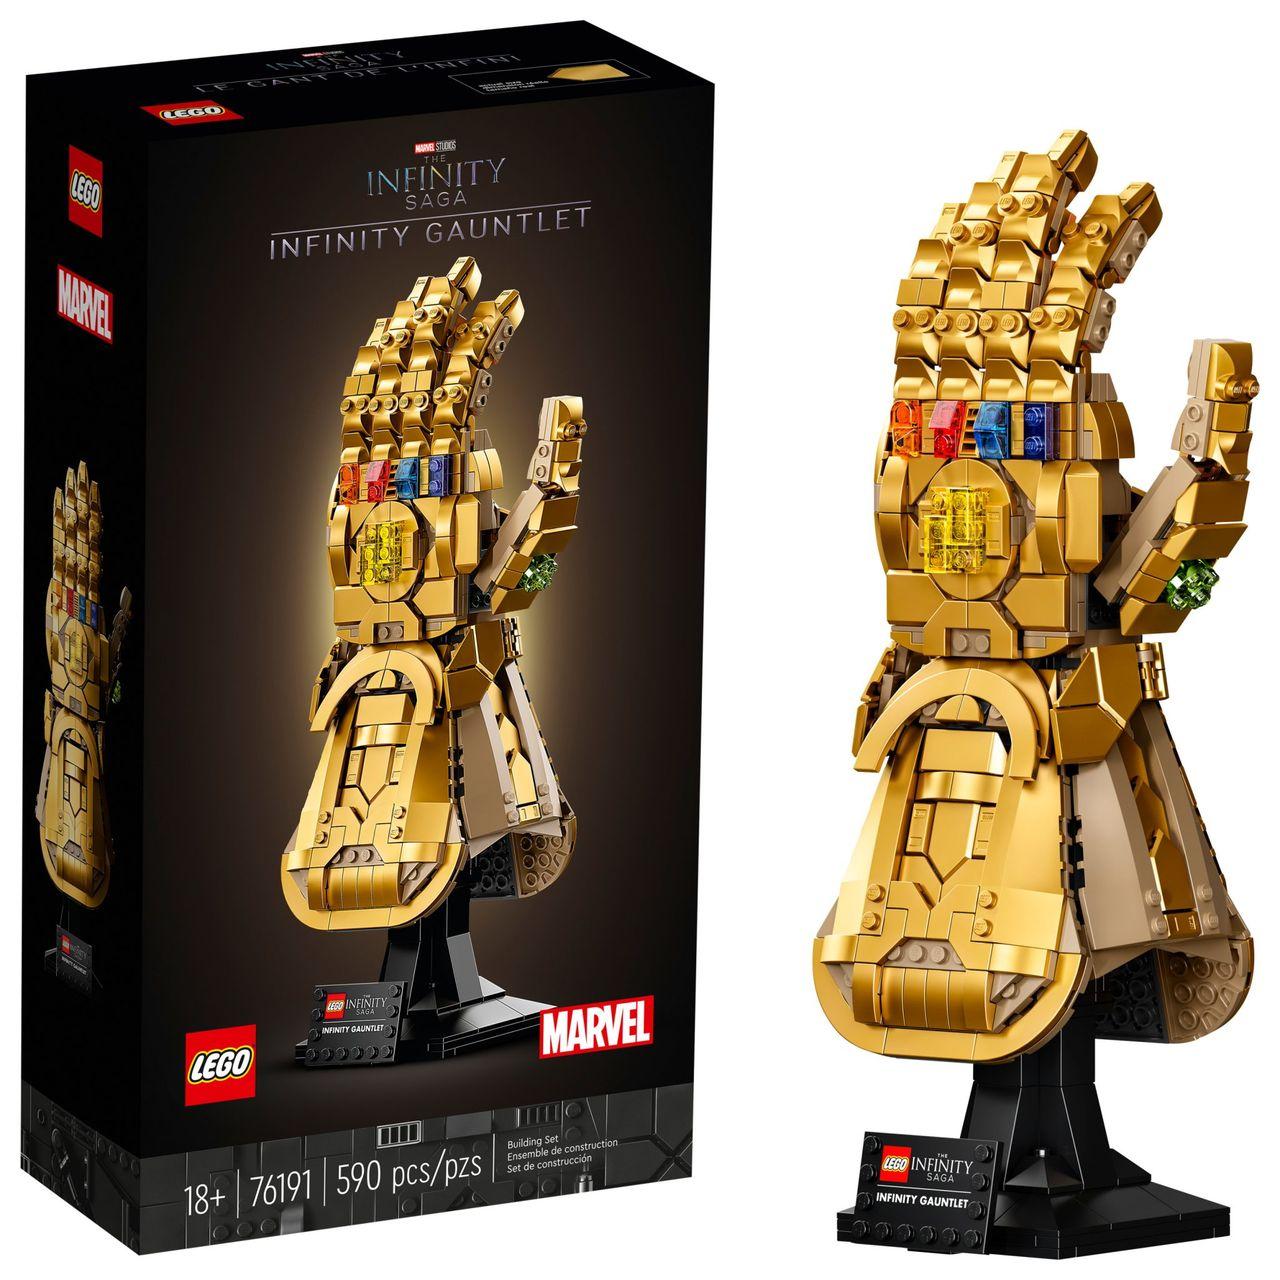 LEGO släpper Infinity Gauntlet-bygge